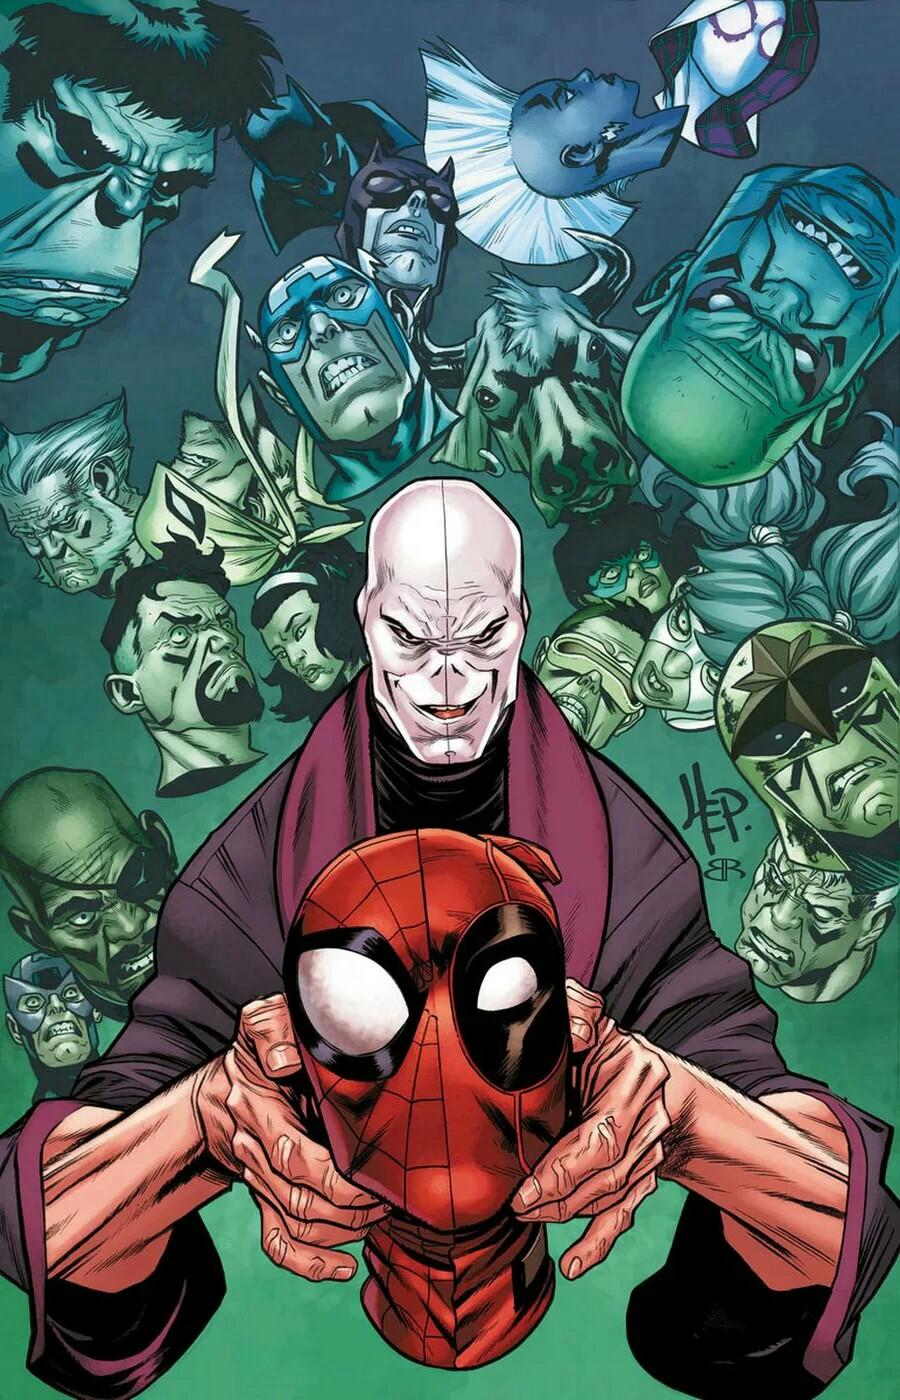 Spider-Man/Deadpool vol. 1 #27